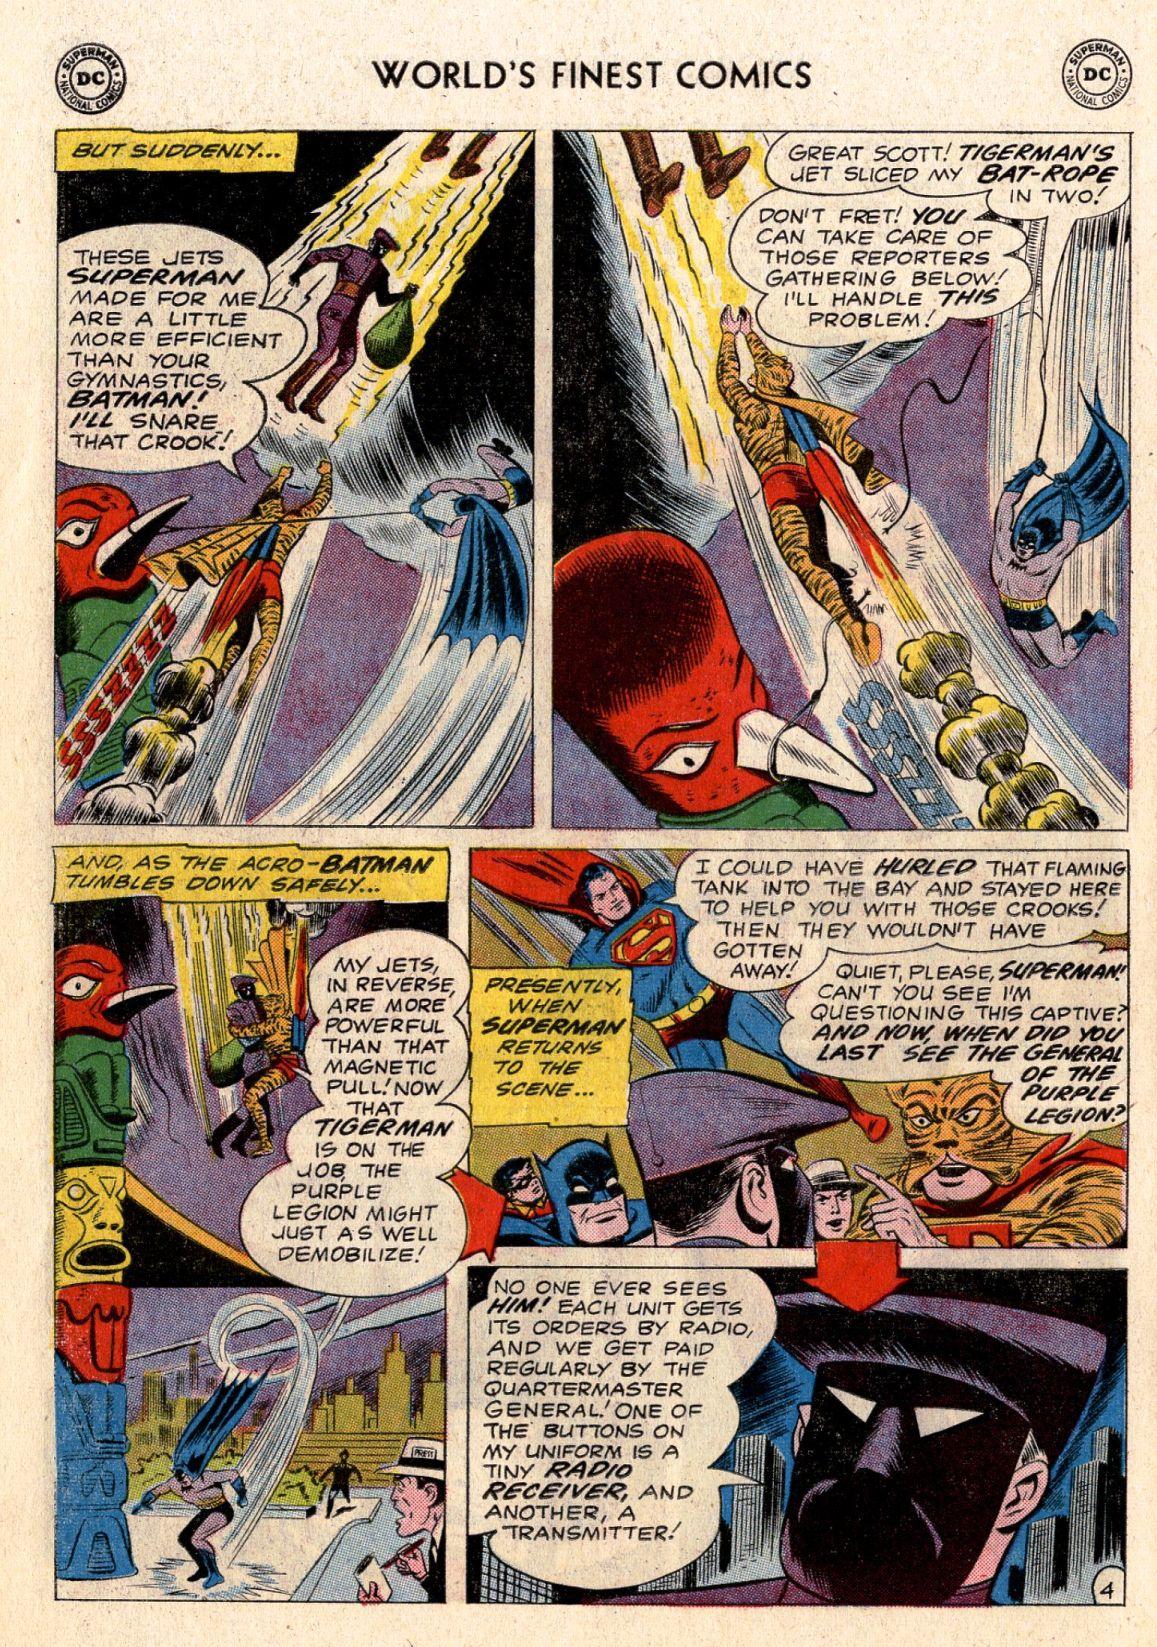 Read online World's Finest Comics comic -  Issue #119 - 6